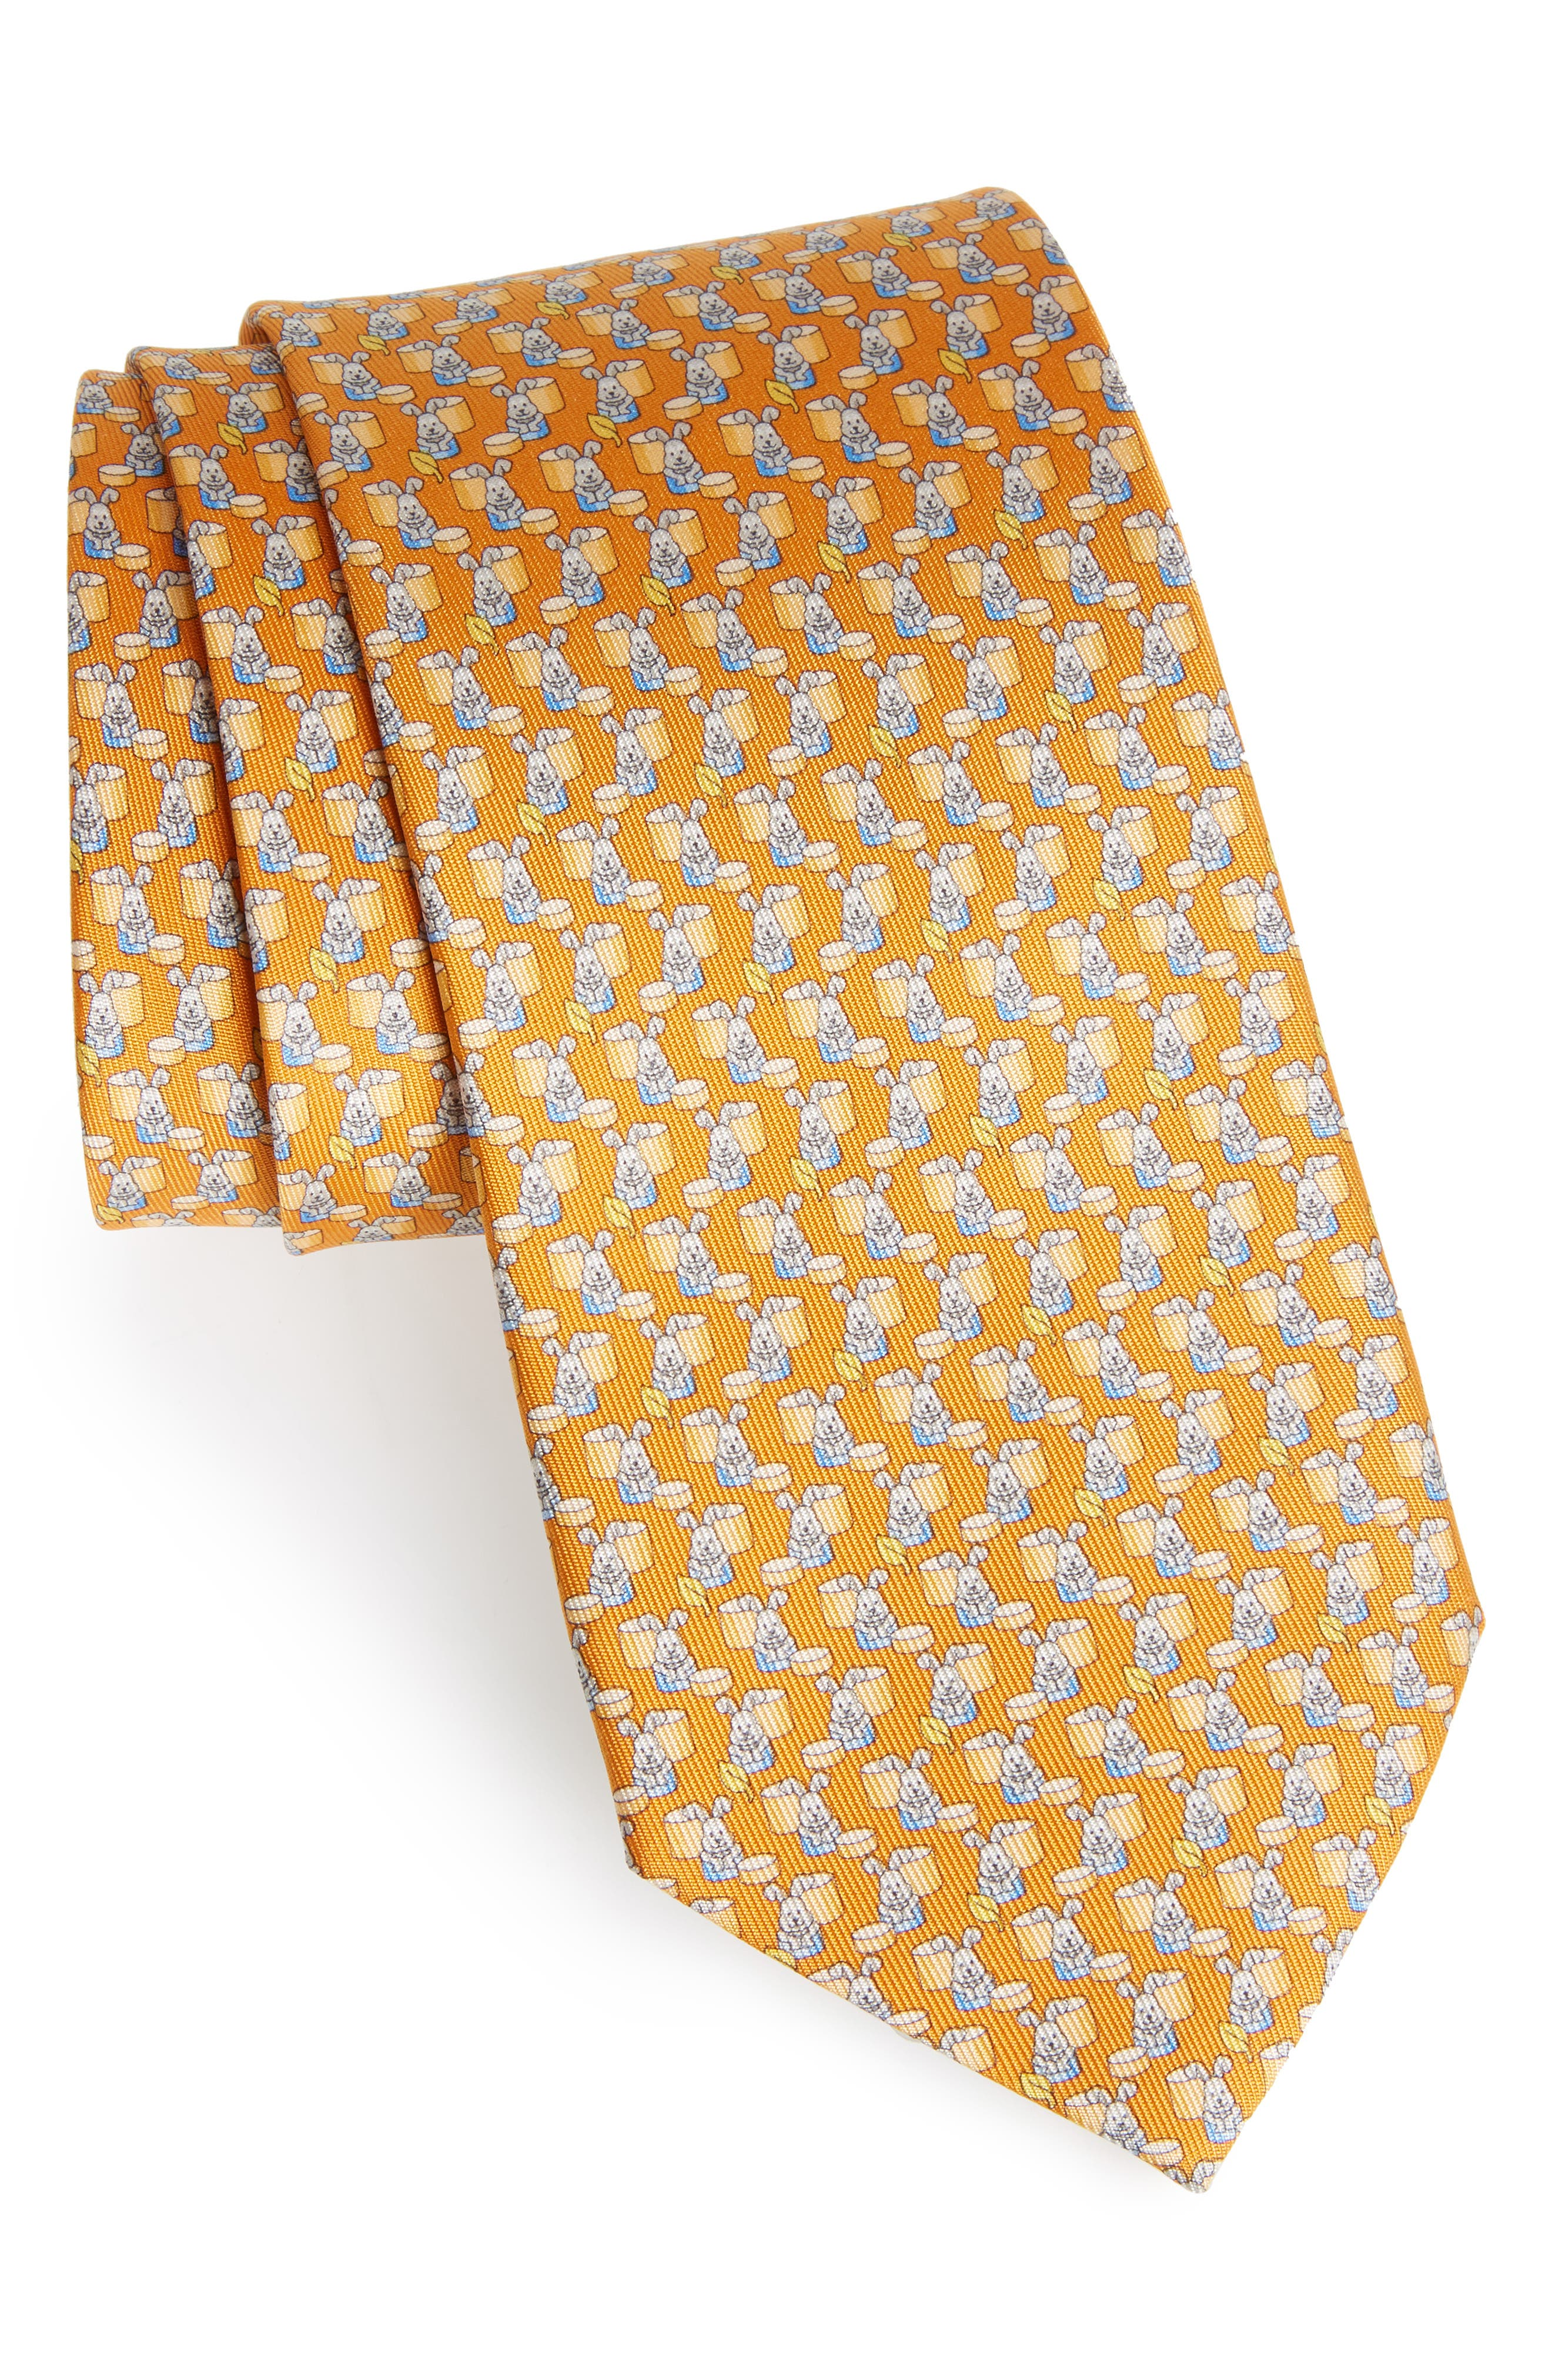 Bunny Print Silk Tie,                             Main thumbnail 1, color,                             Orange